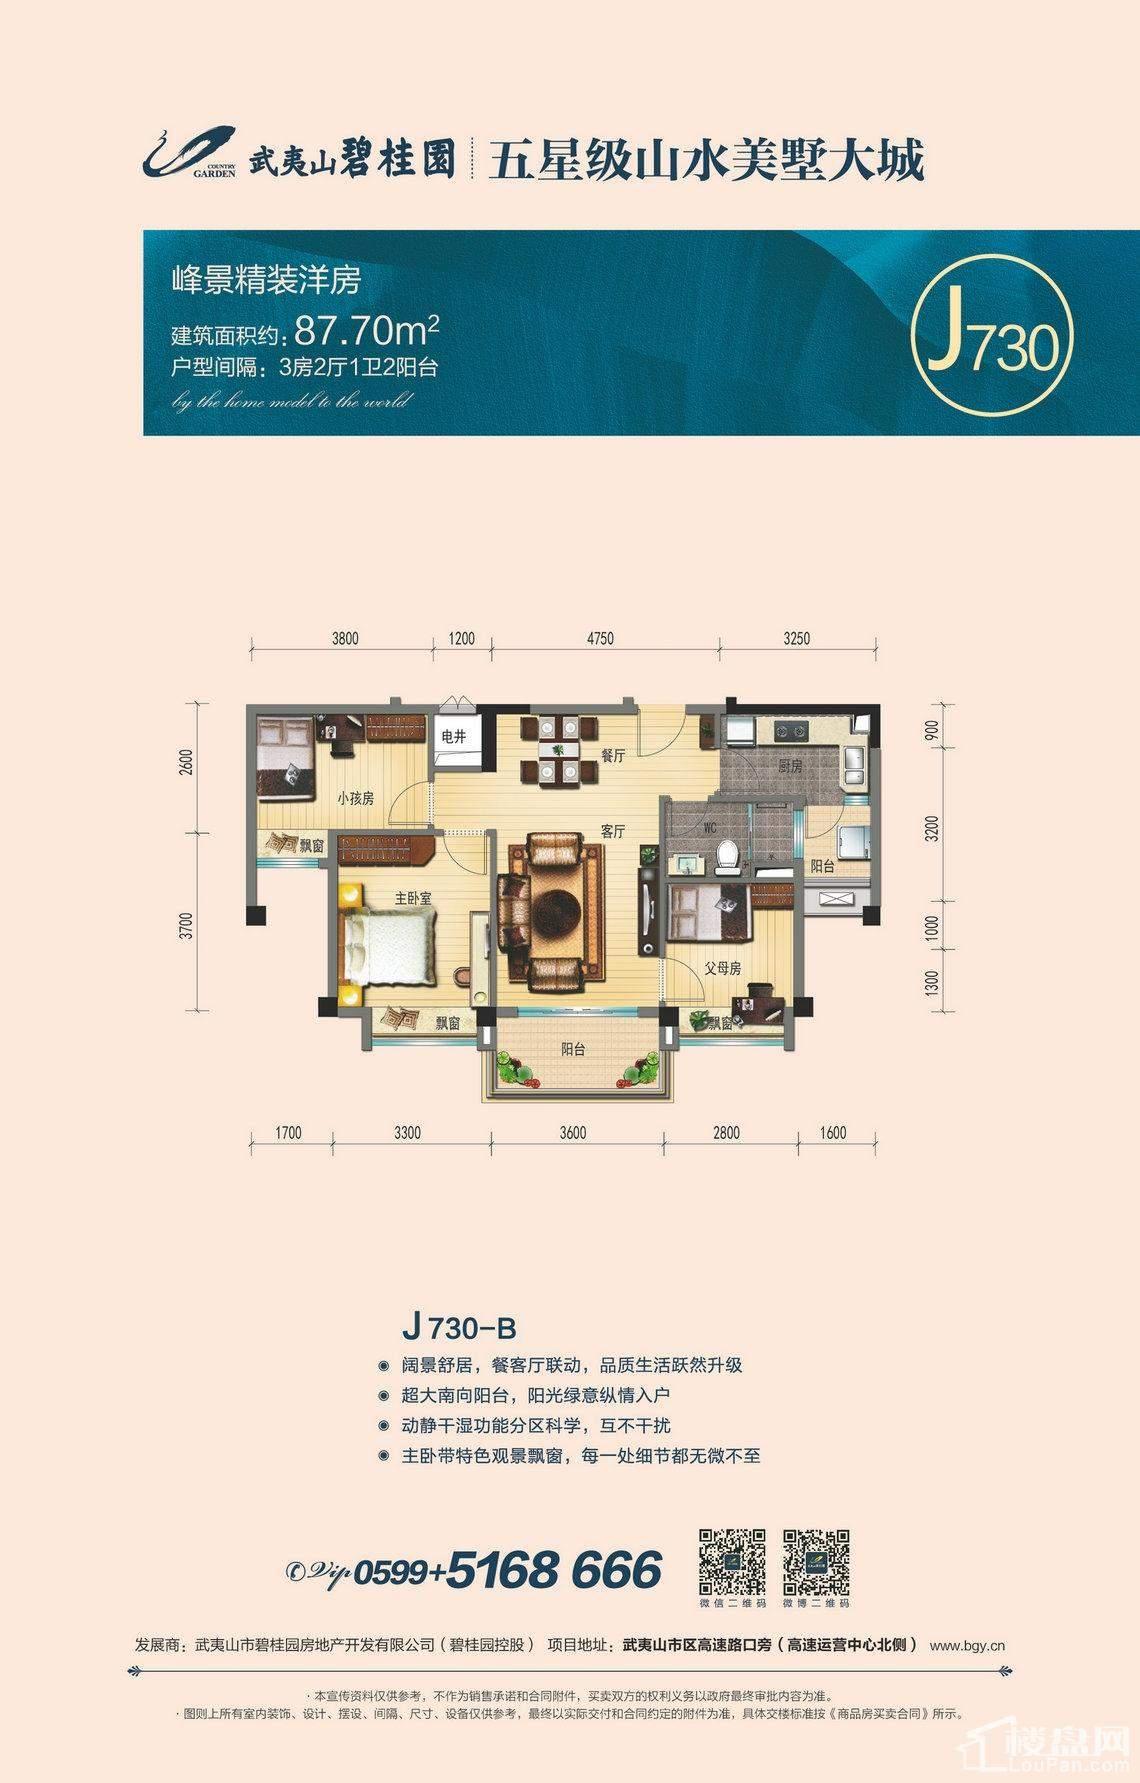 J730-B 峰景精装洋房